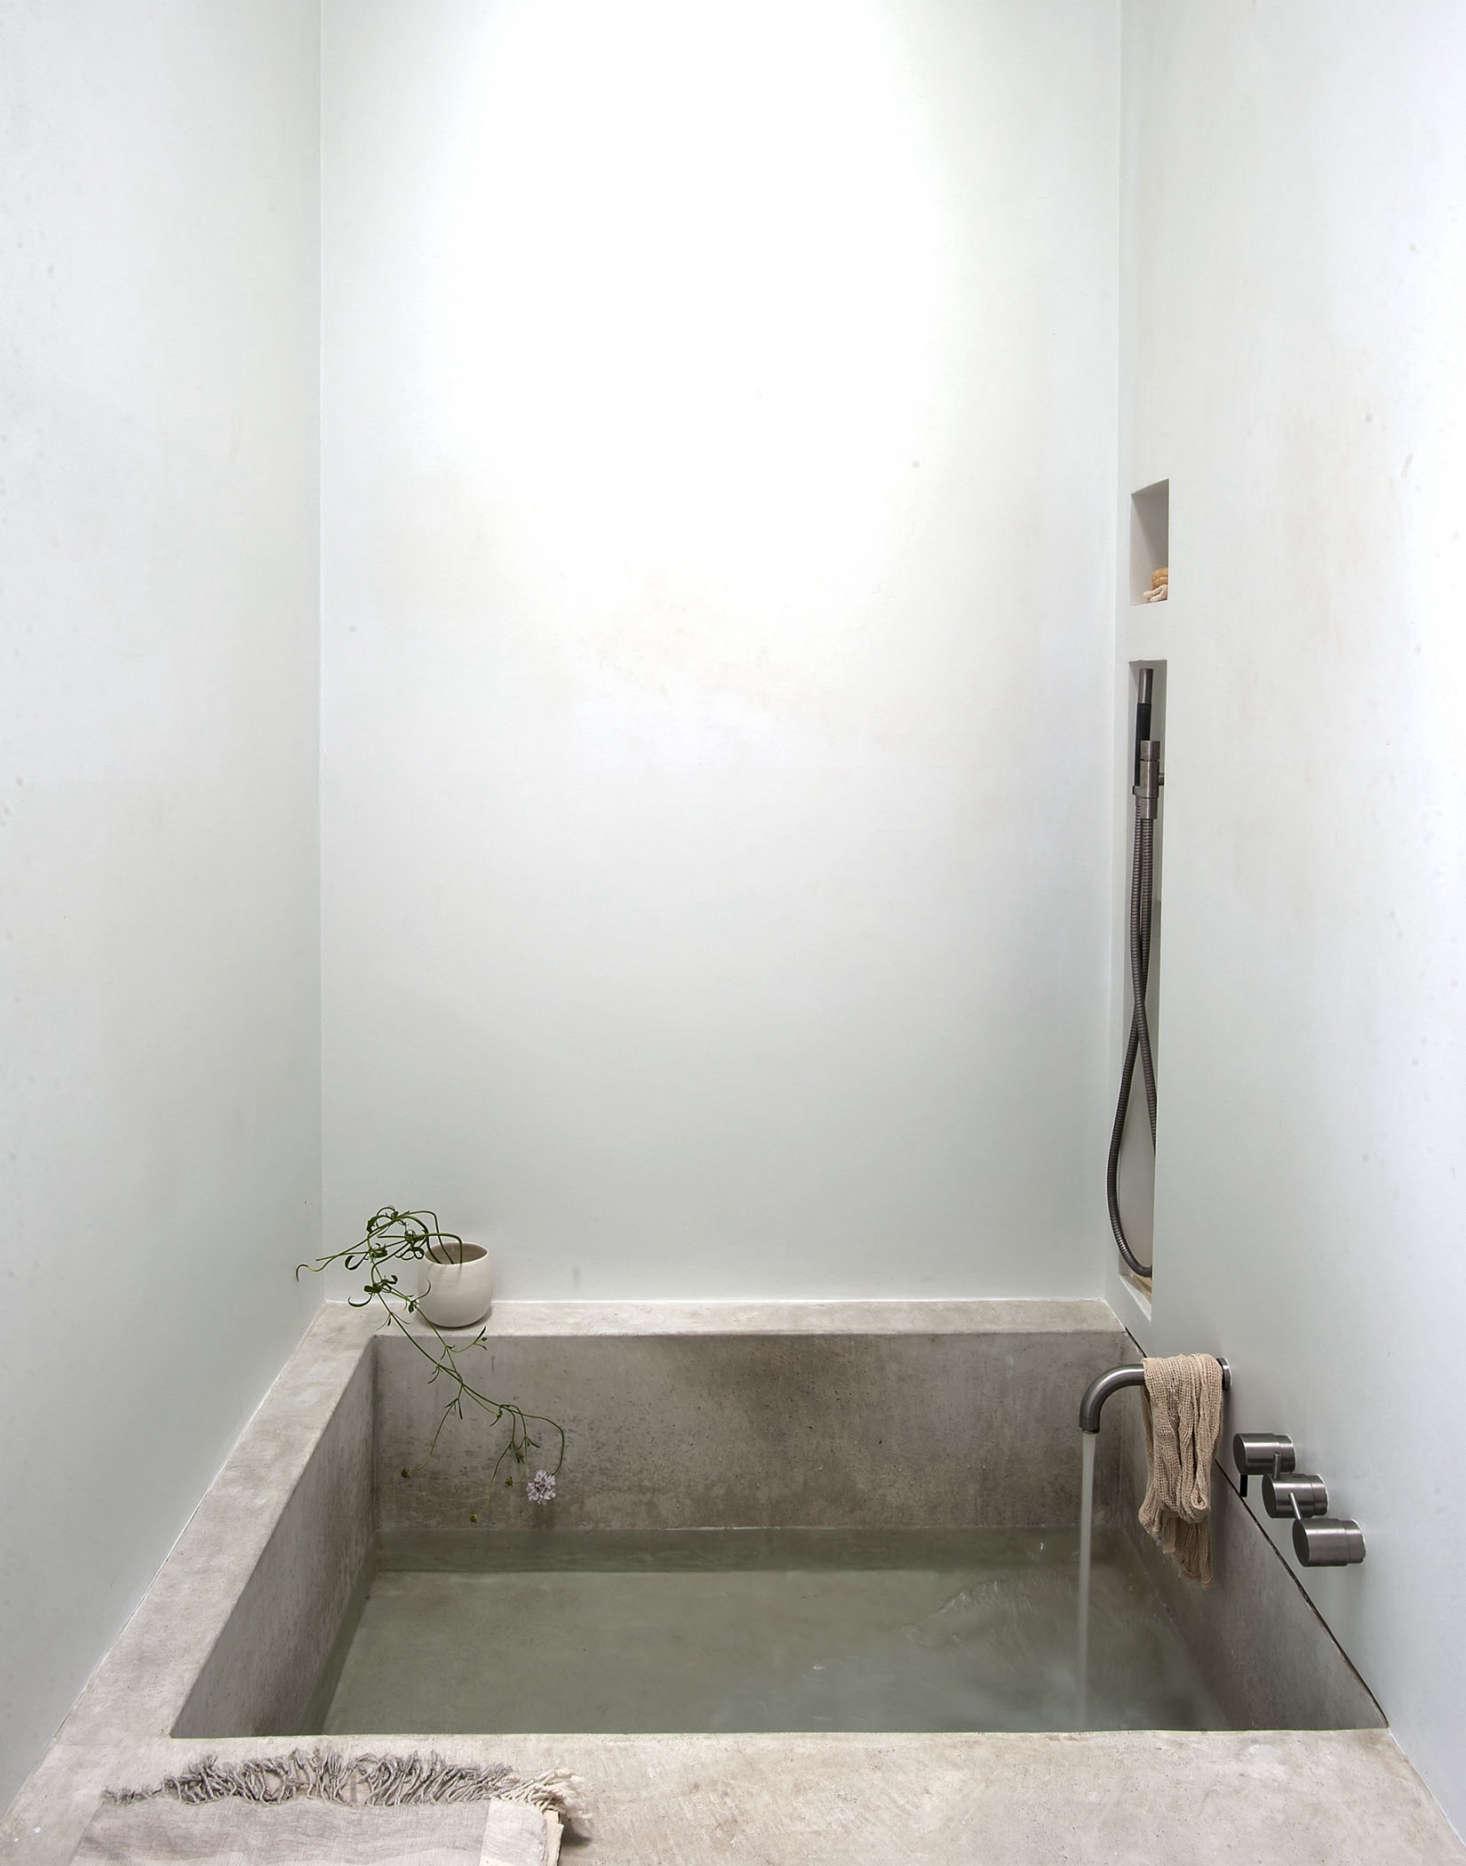 Tiny spa bath in LA by Michaela Scherrer photo by Matthew Williams | Remodelista